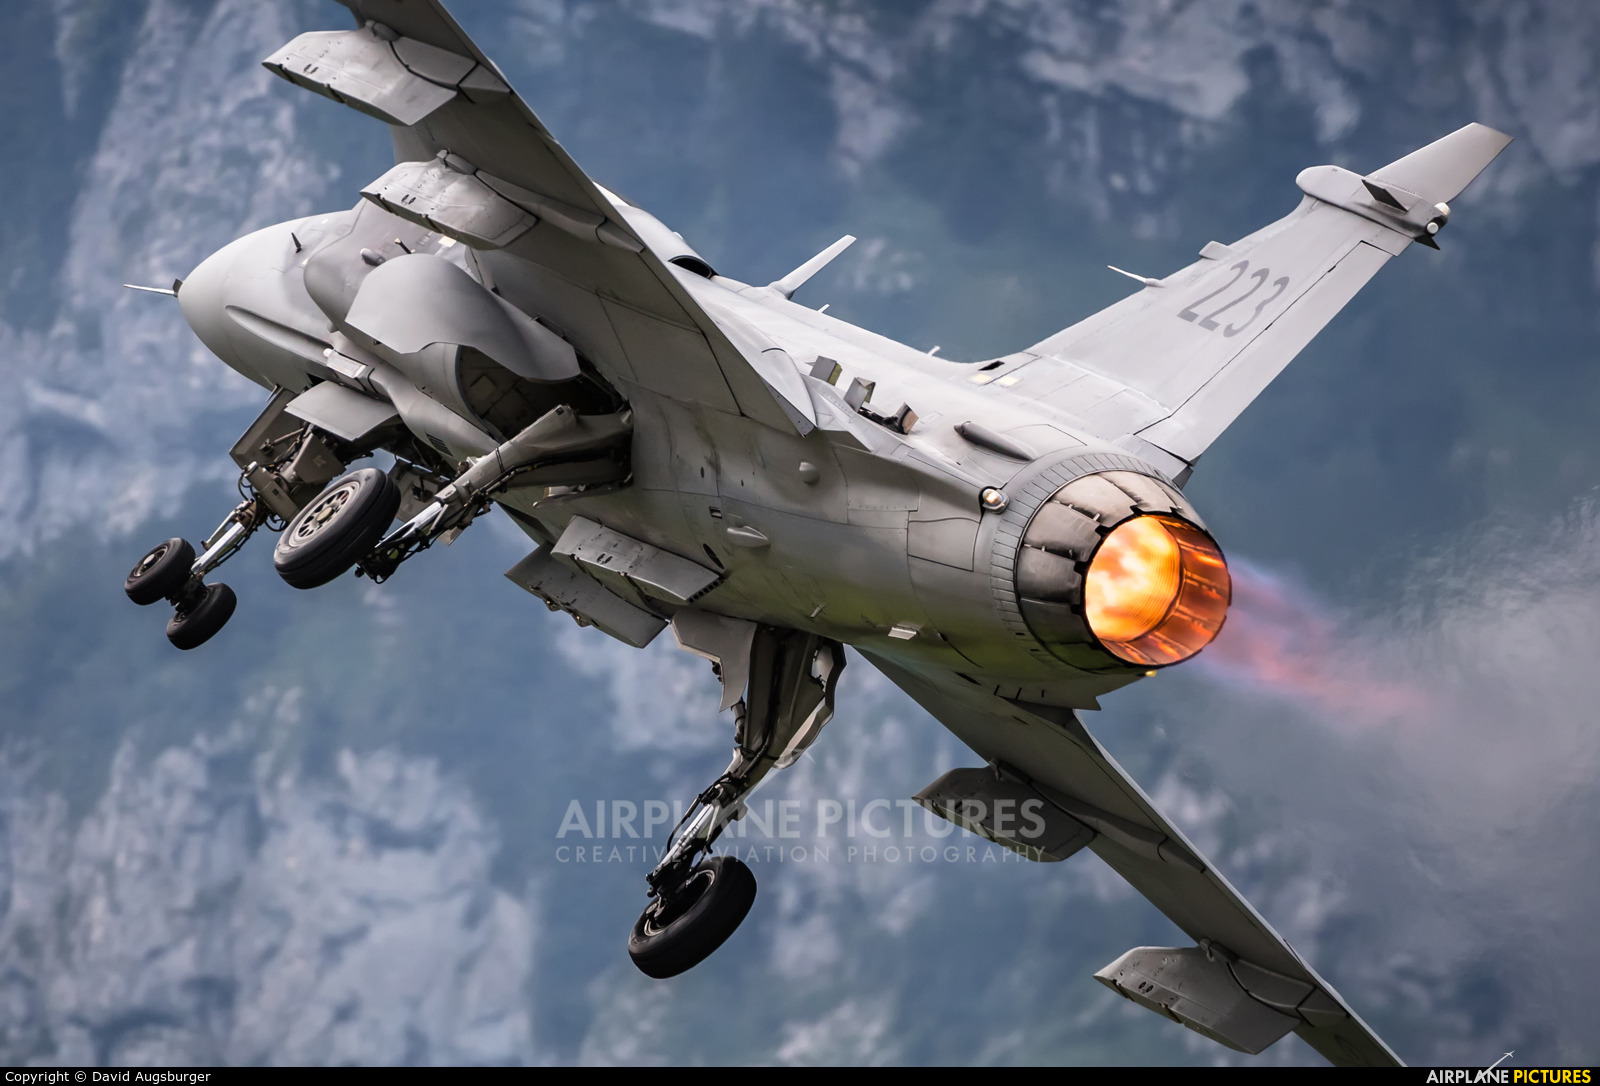 Sweden - Air Force 39223 aircraft at Mollis